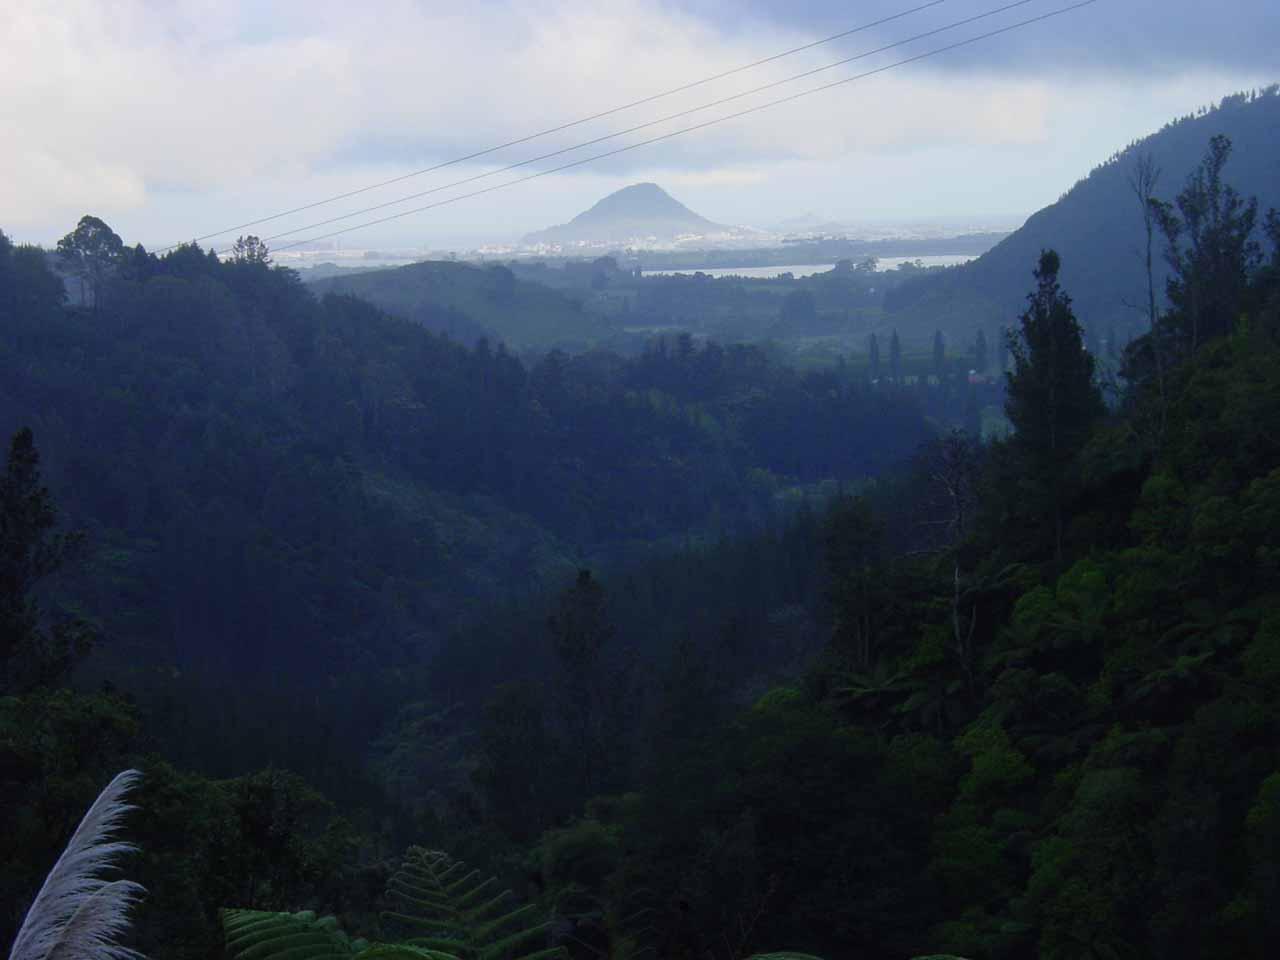 Looking towards Mt Maunganui and the Port of Tauranga